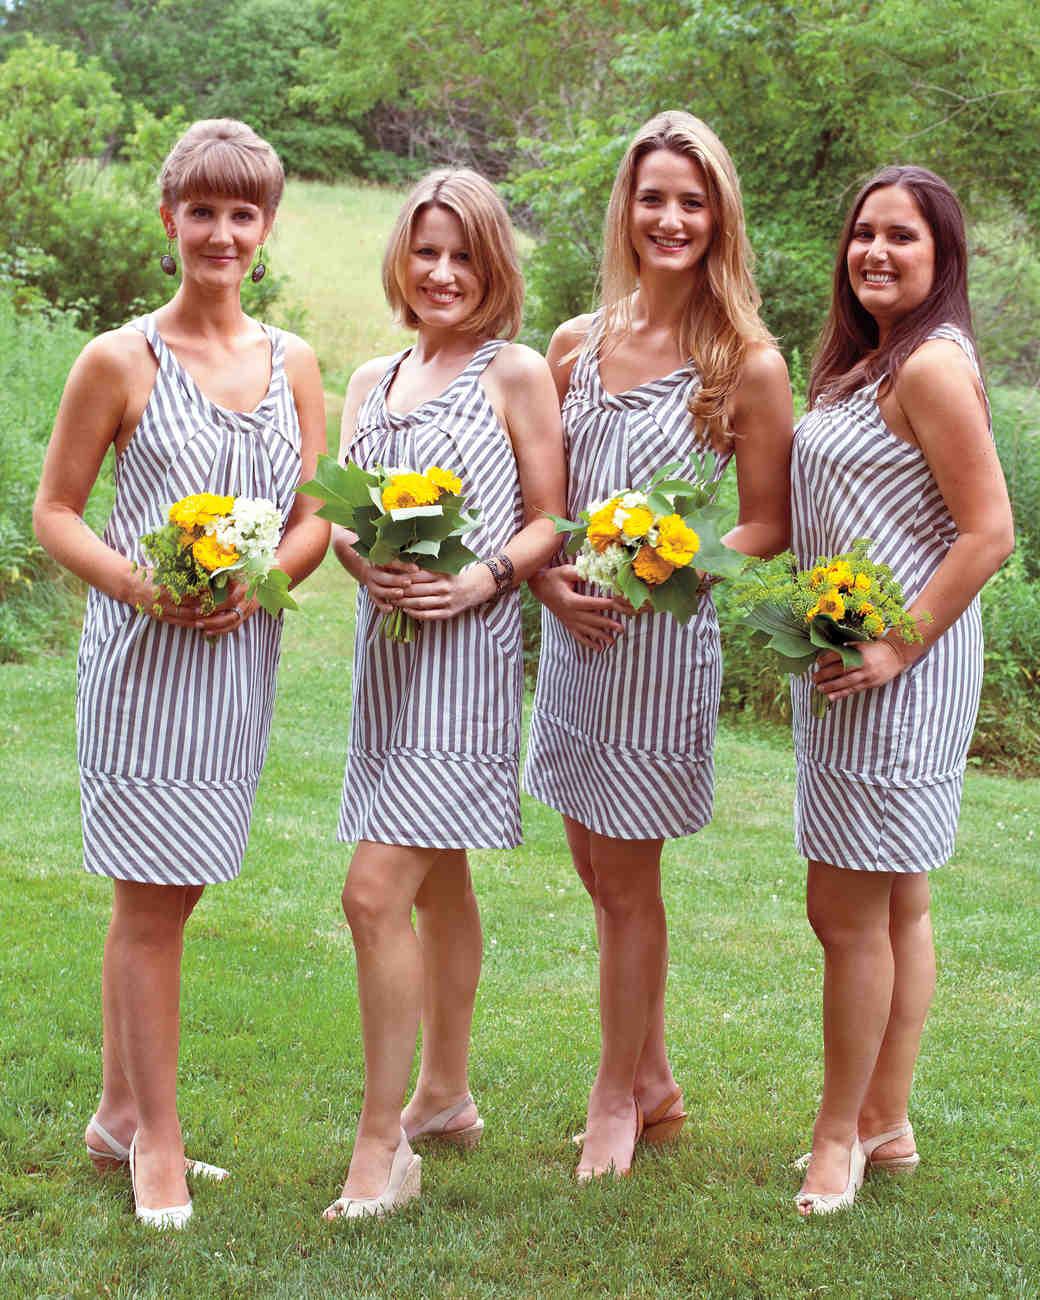 bridesmaids-0811mwd106246.jpg